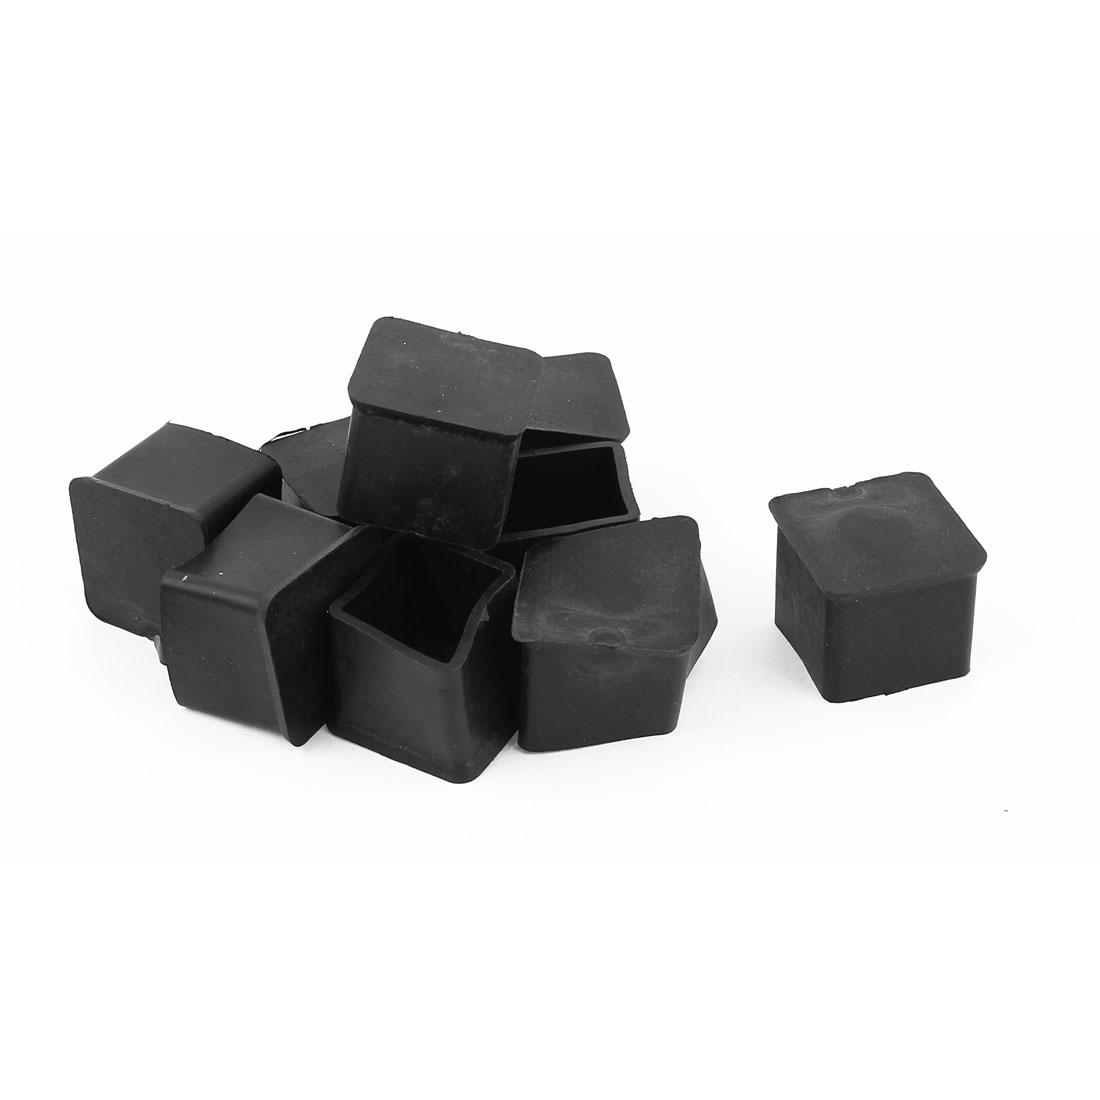 Furniture Chair Table Desk Leg Square Rubber Feet Cover Protector 9pcs Black